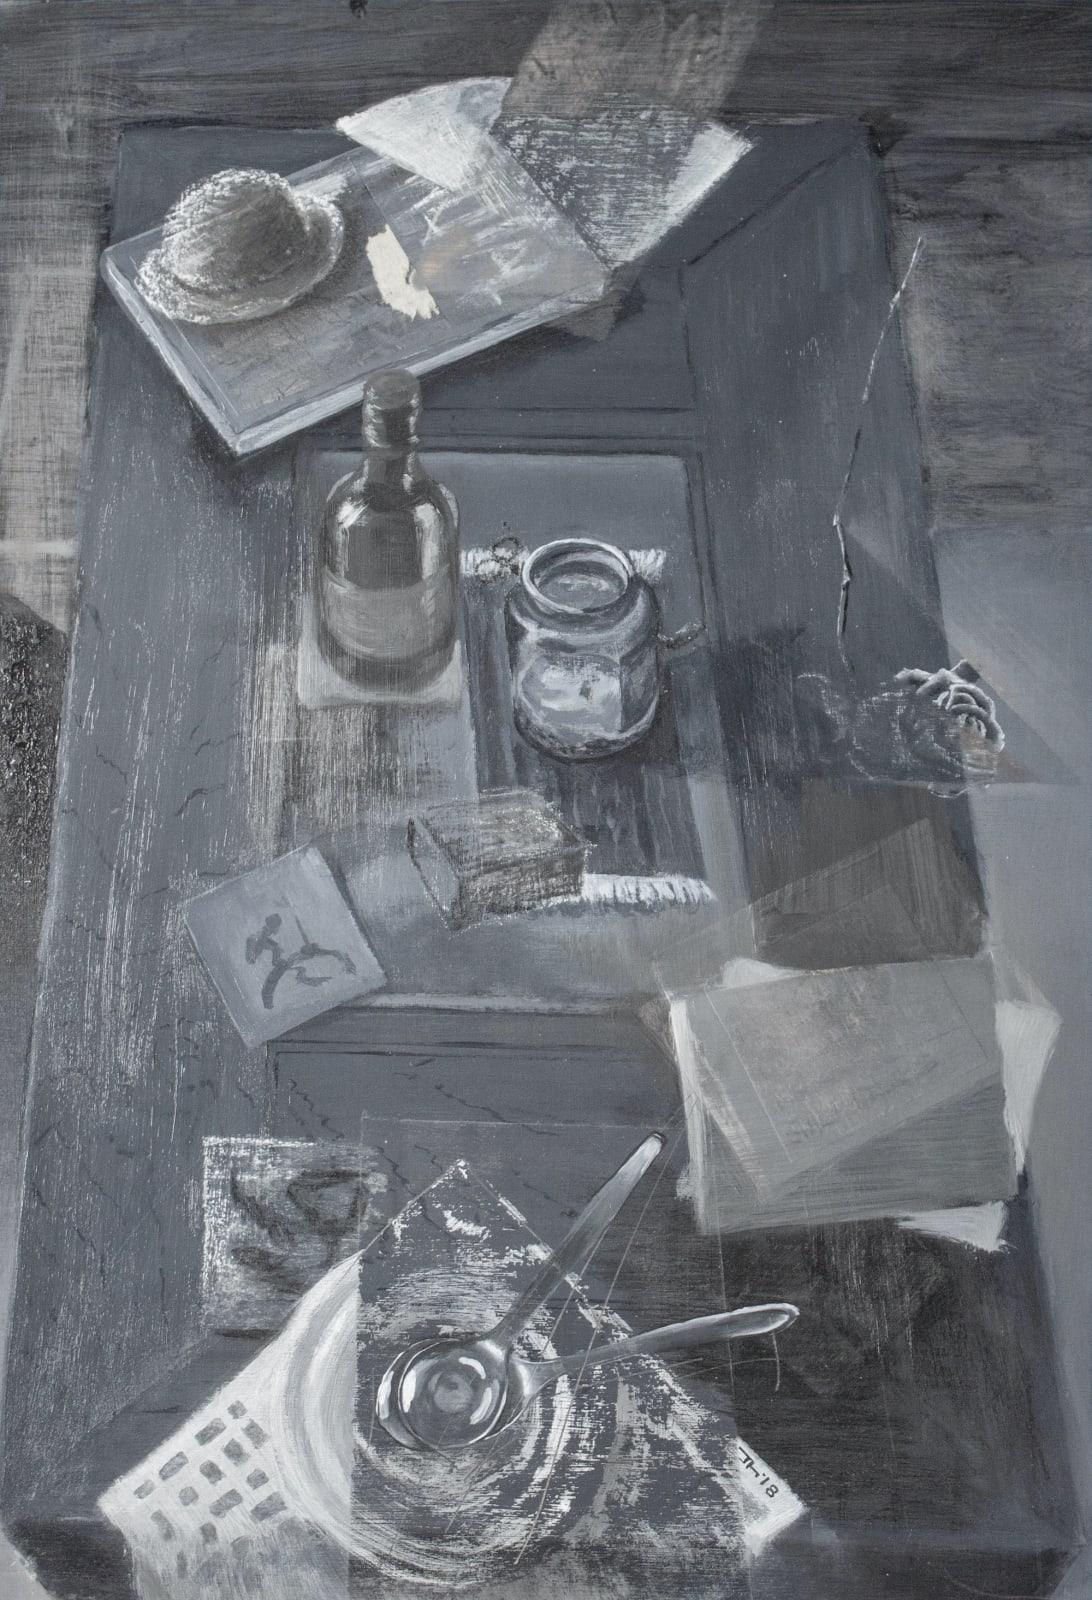 John Hamilton, Tabled Memories